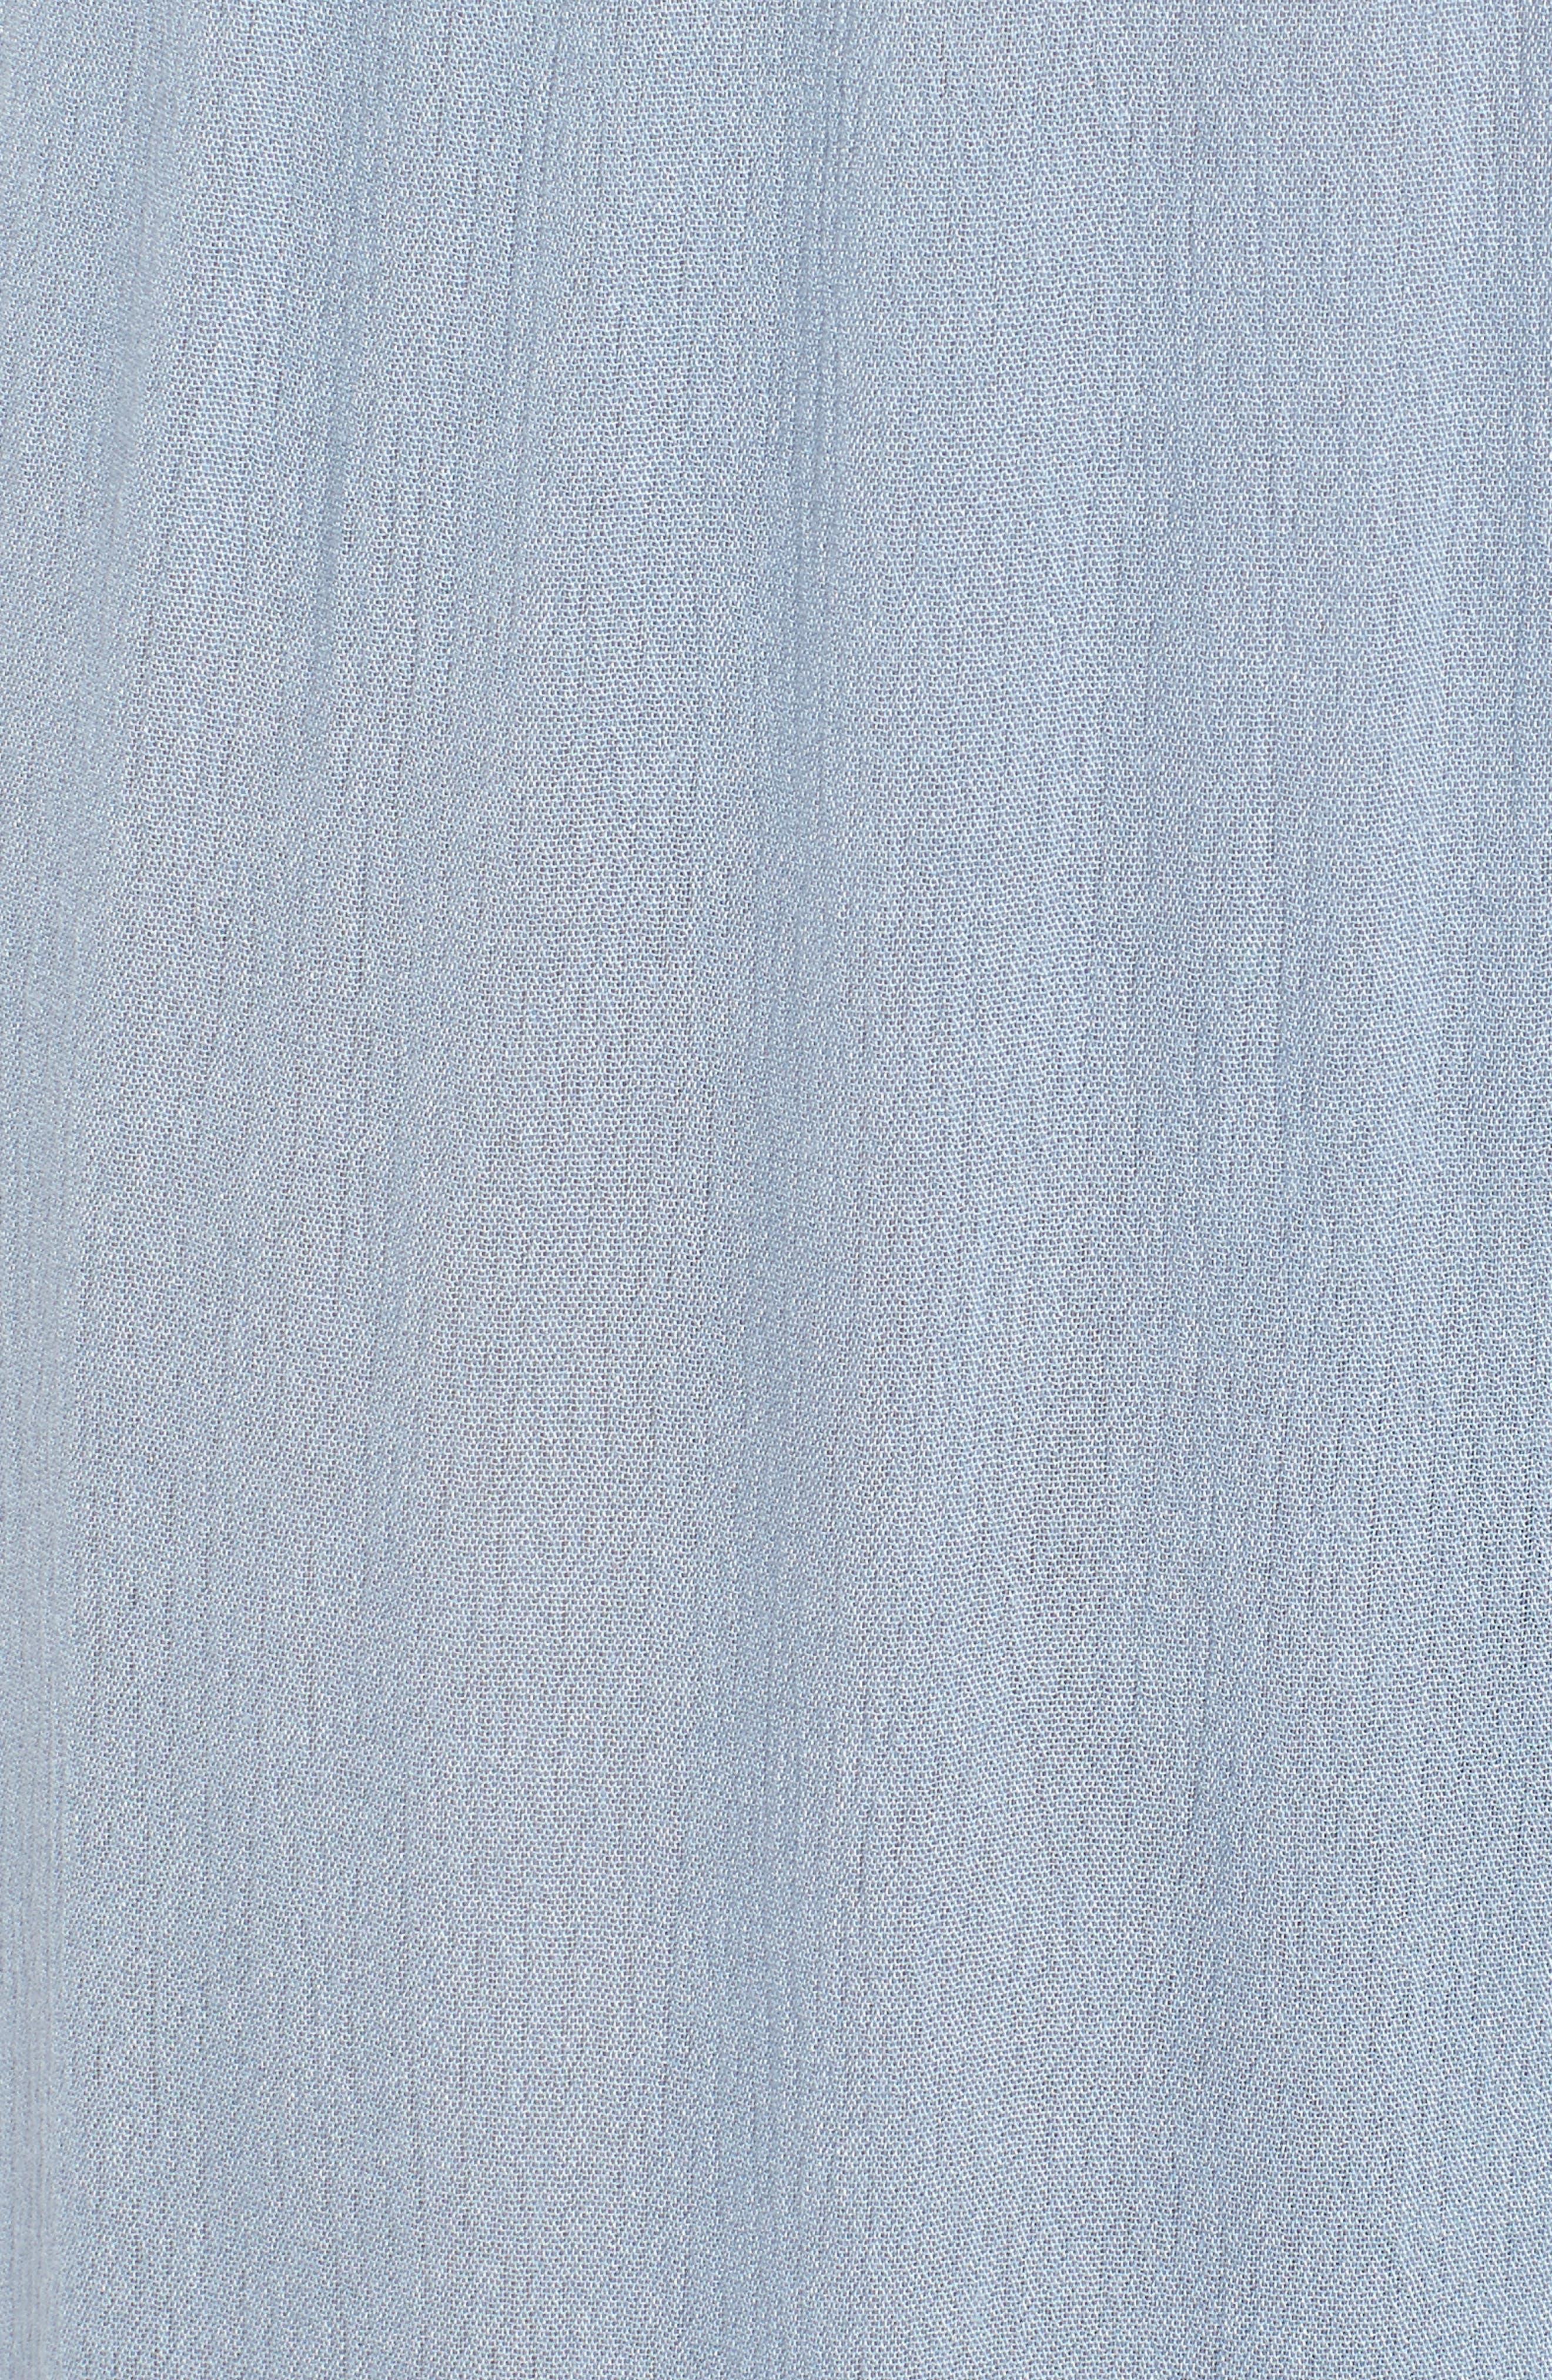 Mystique Ruffle Hem Beach Pants,                             Alternate thumbnail 6, color,                             400